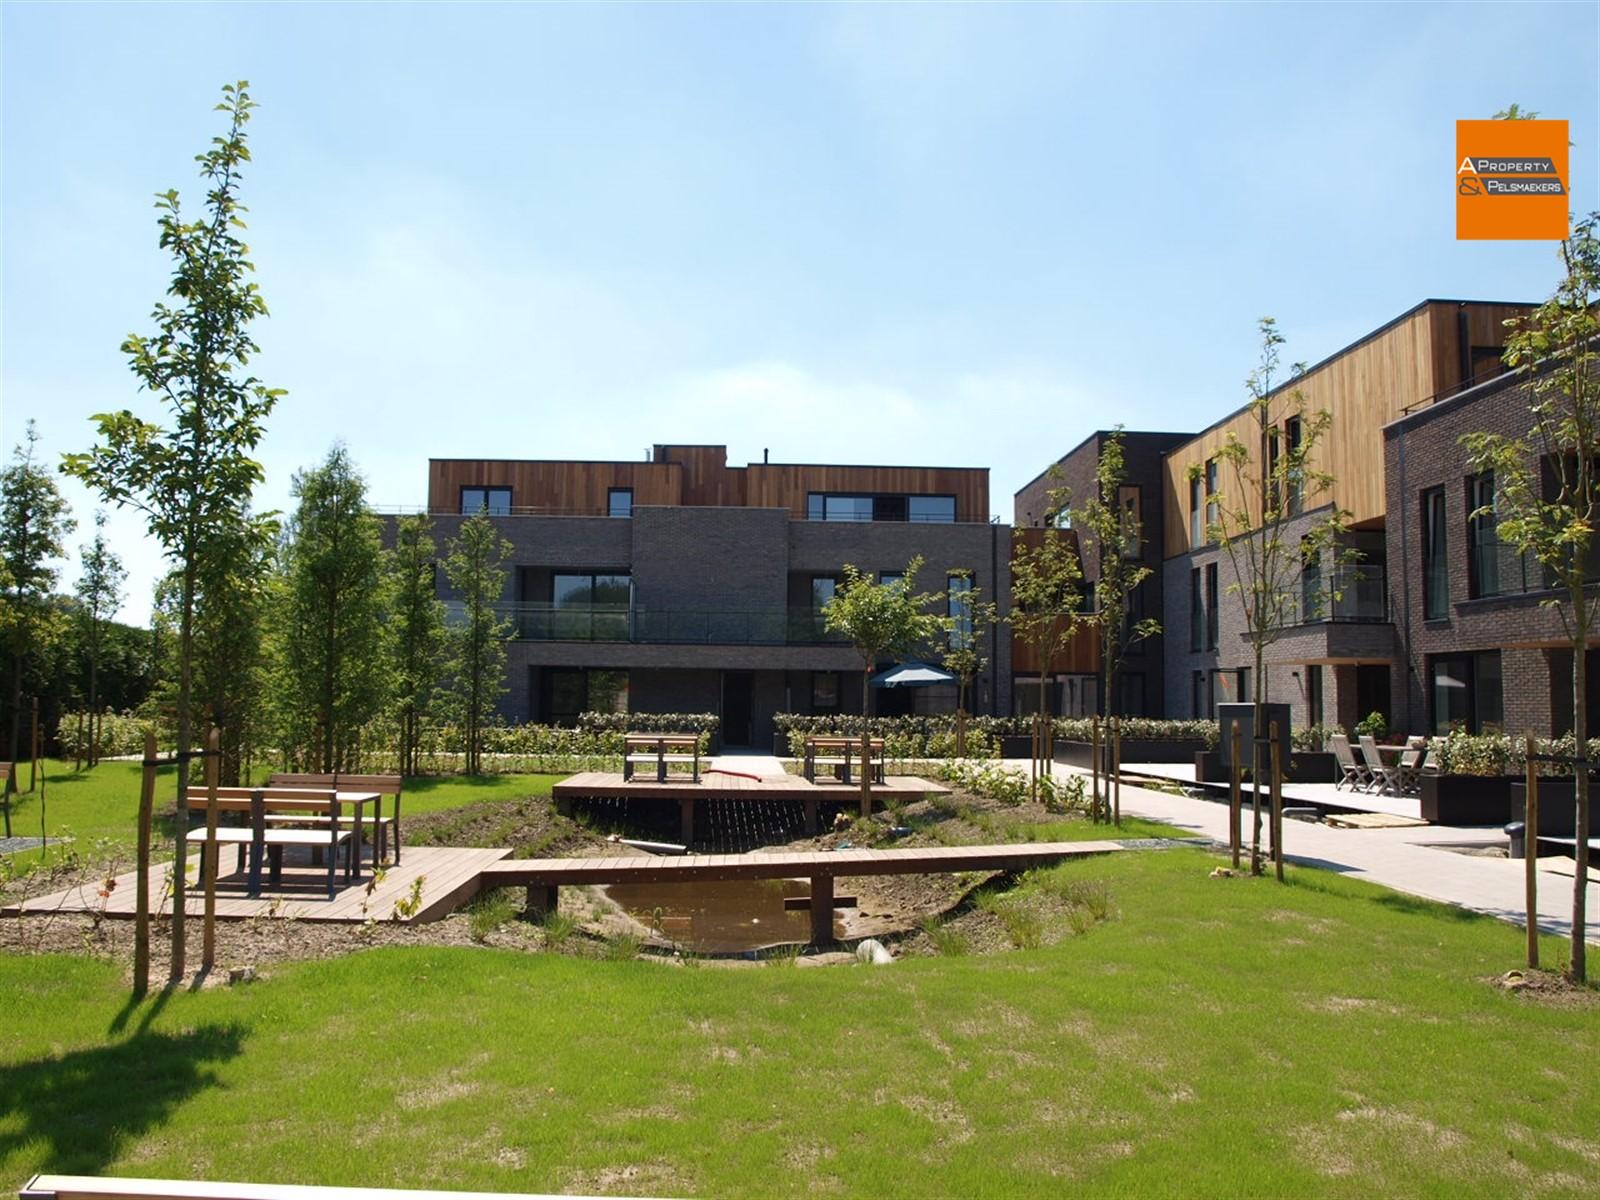 Real estate project : Residentie Heiveld IN Sint-Katelijne-Waver (2860) - Price